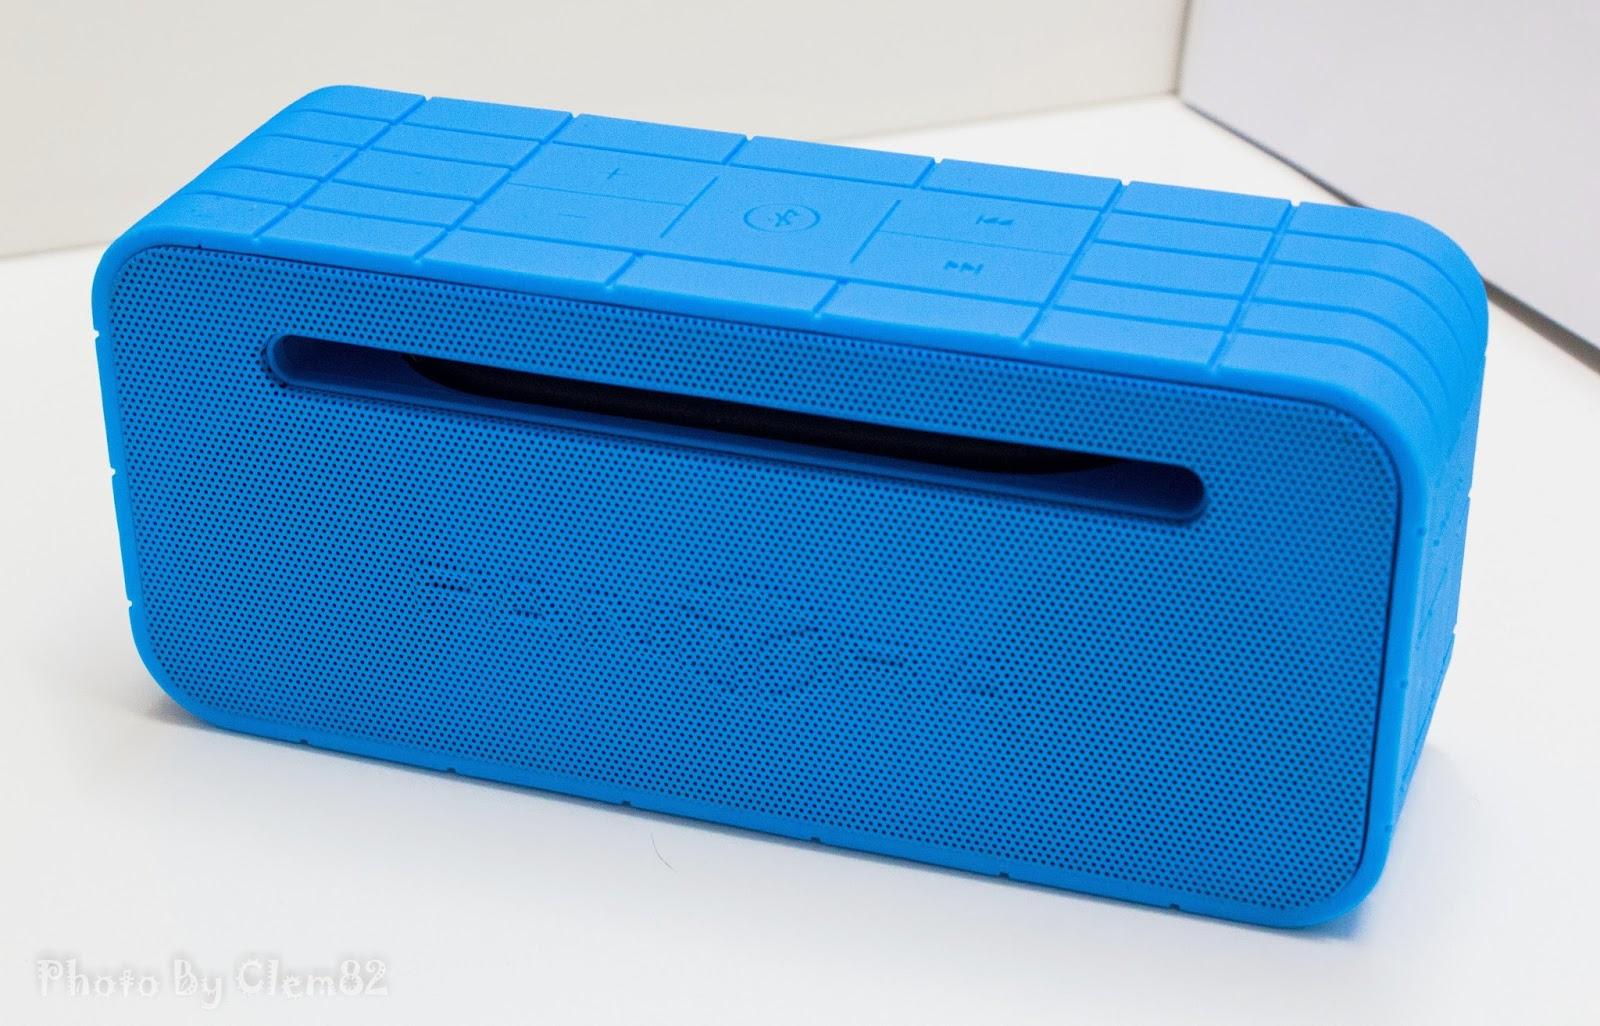 Opening Pandora's Box: SonicGear Pandora Wireless Bluetooth Media Player Series 13